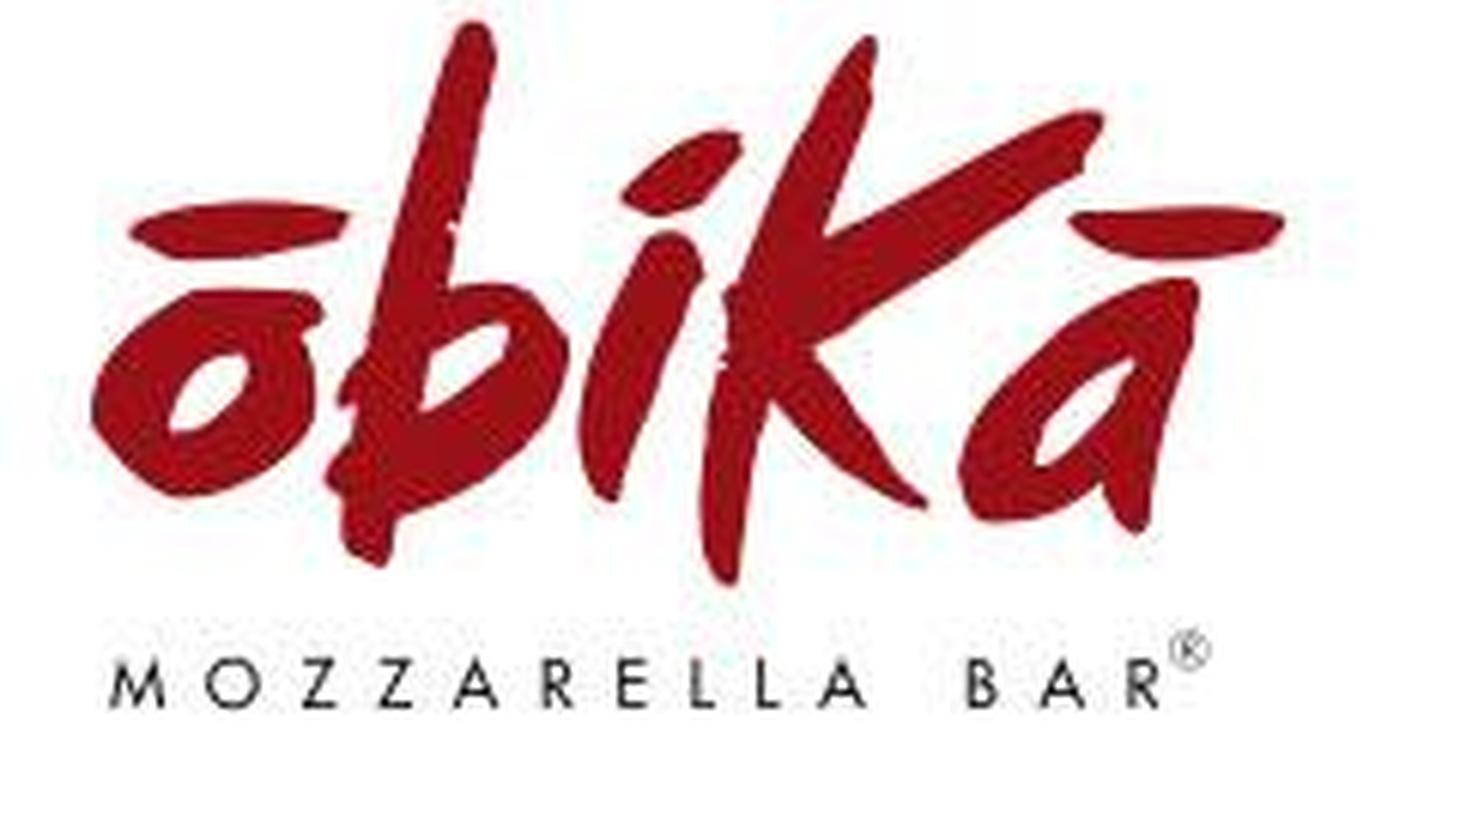 Jonathan reviews Obika, a mozzarella bar in the Westfield Century City Shopping Center.